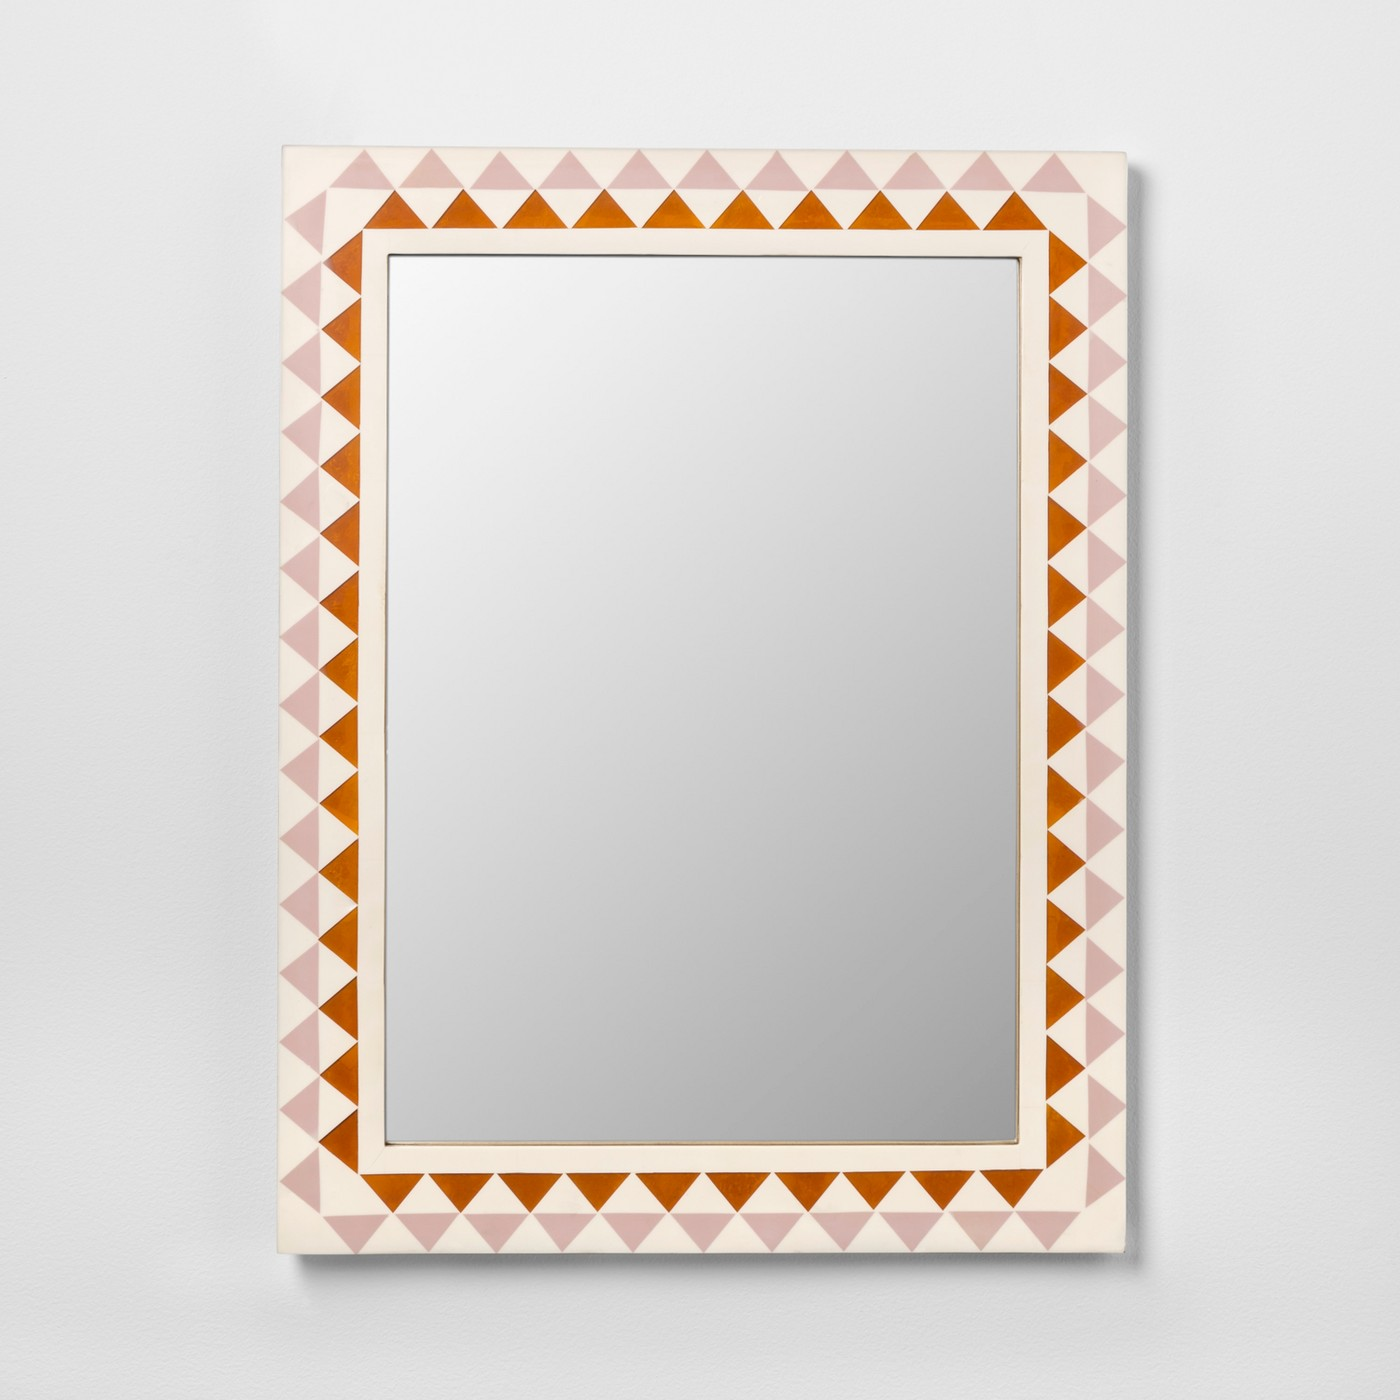 Pieced Triangle Frame Decorative Wall Mirror - Opalhouse™